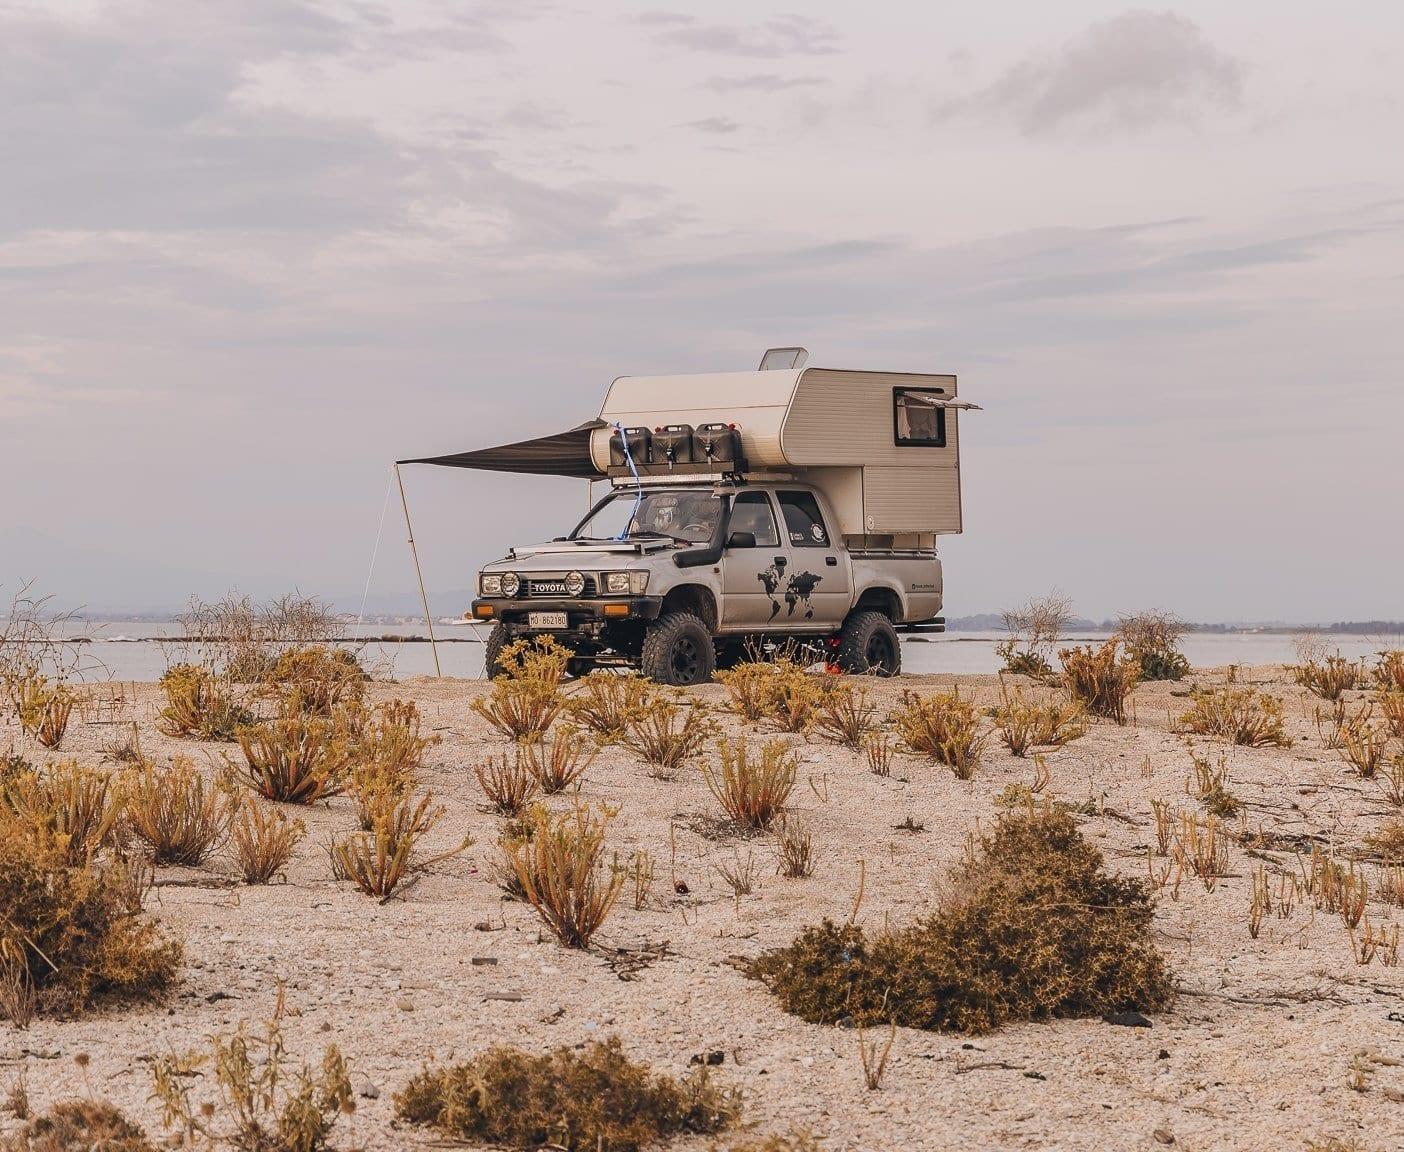 toyota-hilux-ln-105-camper-pickup-vanlife-kaufen-ausbau-5